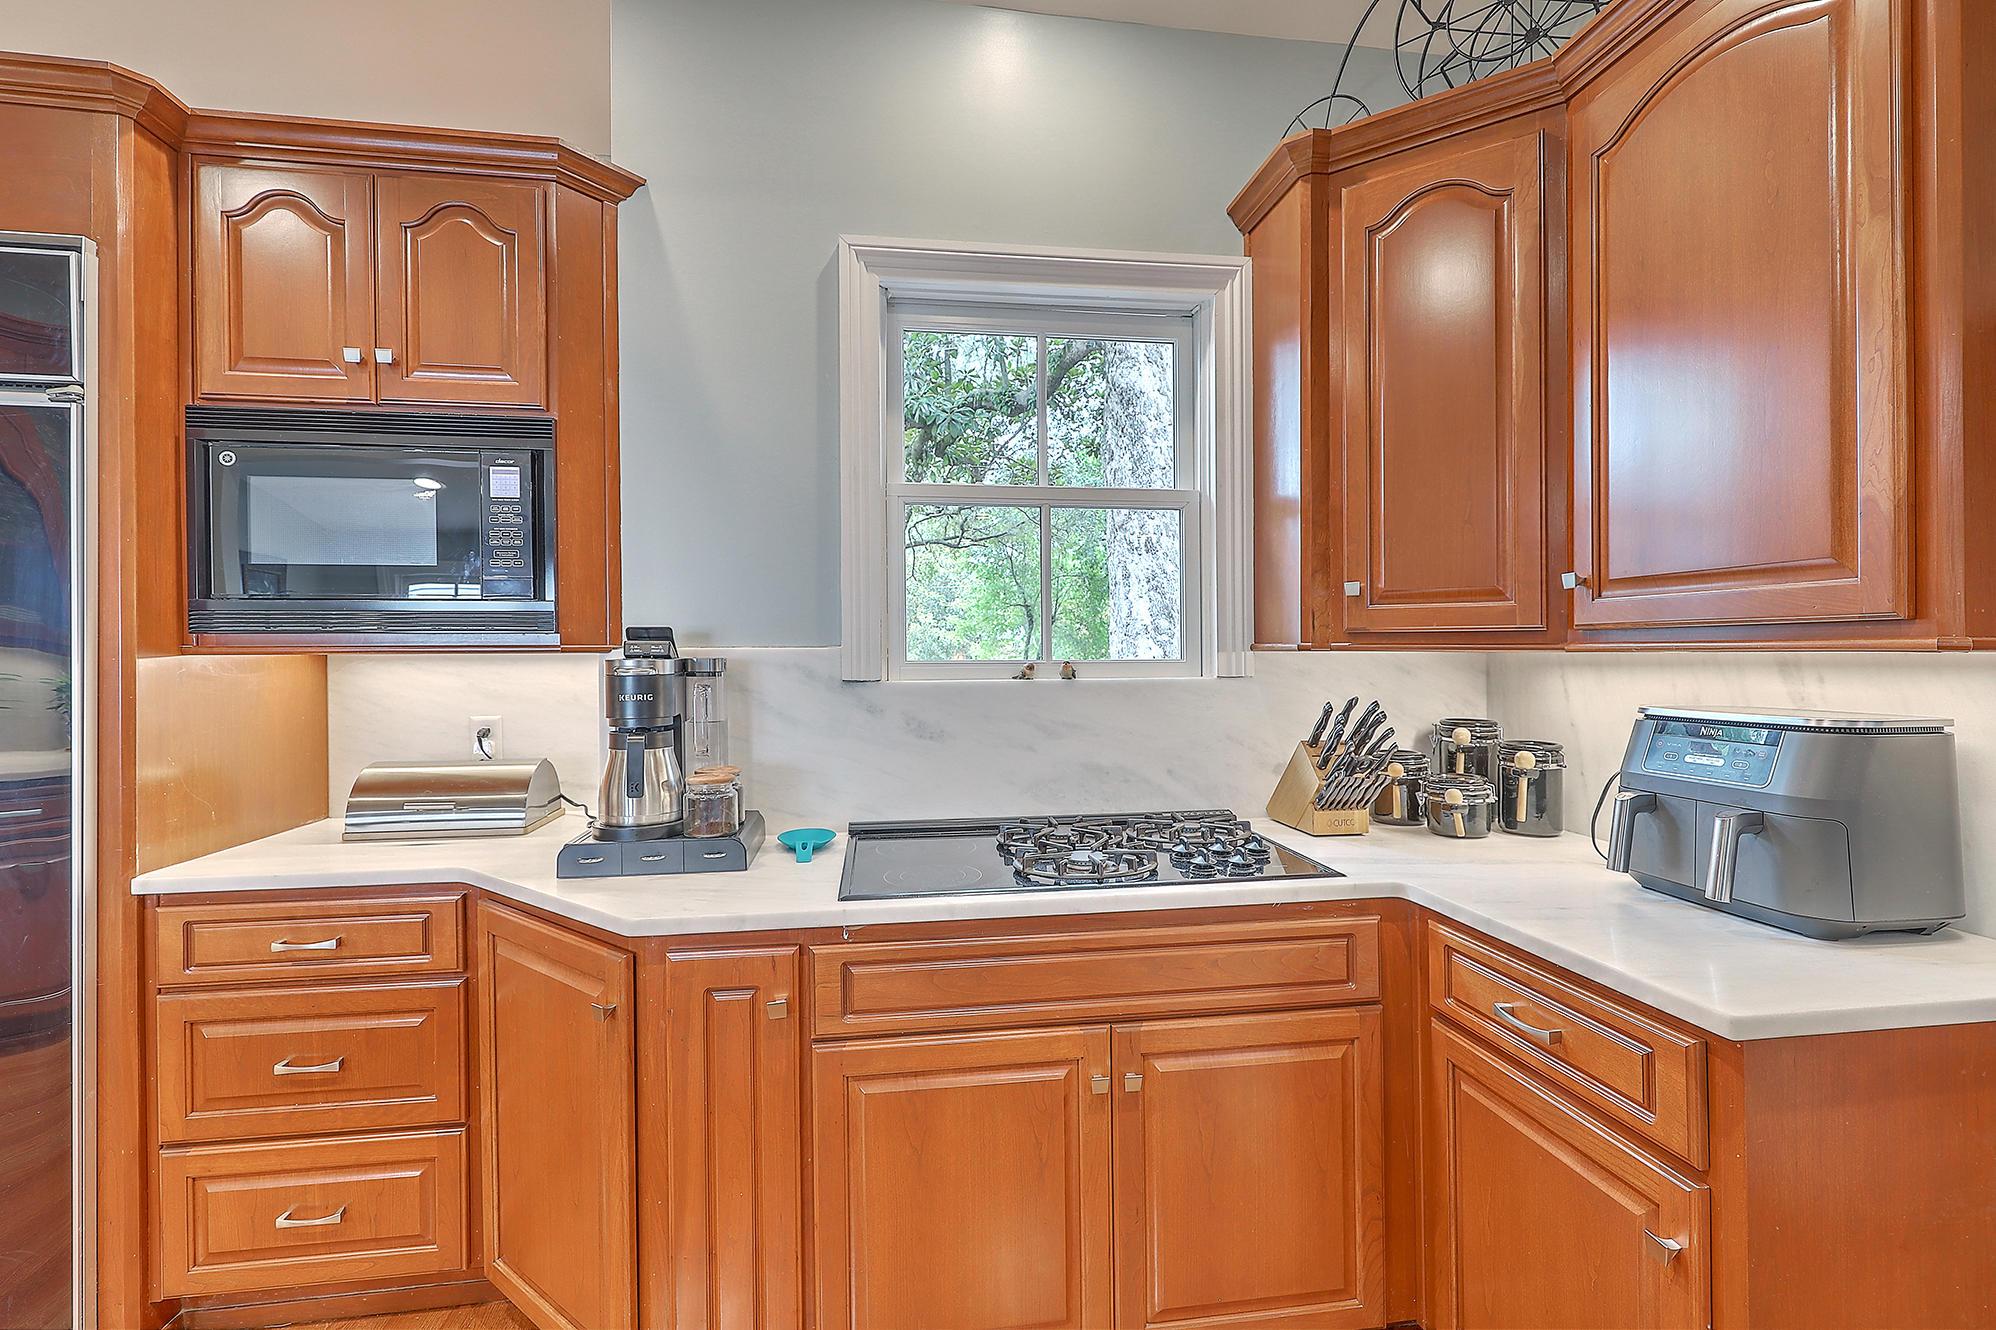 Summerville Homes For Sale - 102 Hickory, Summerville, SC - 51